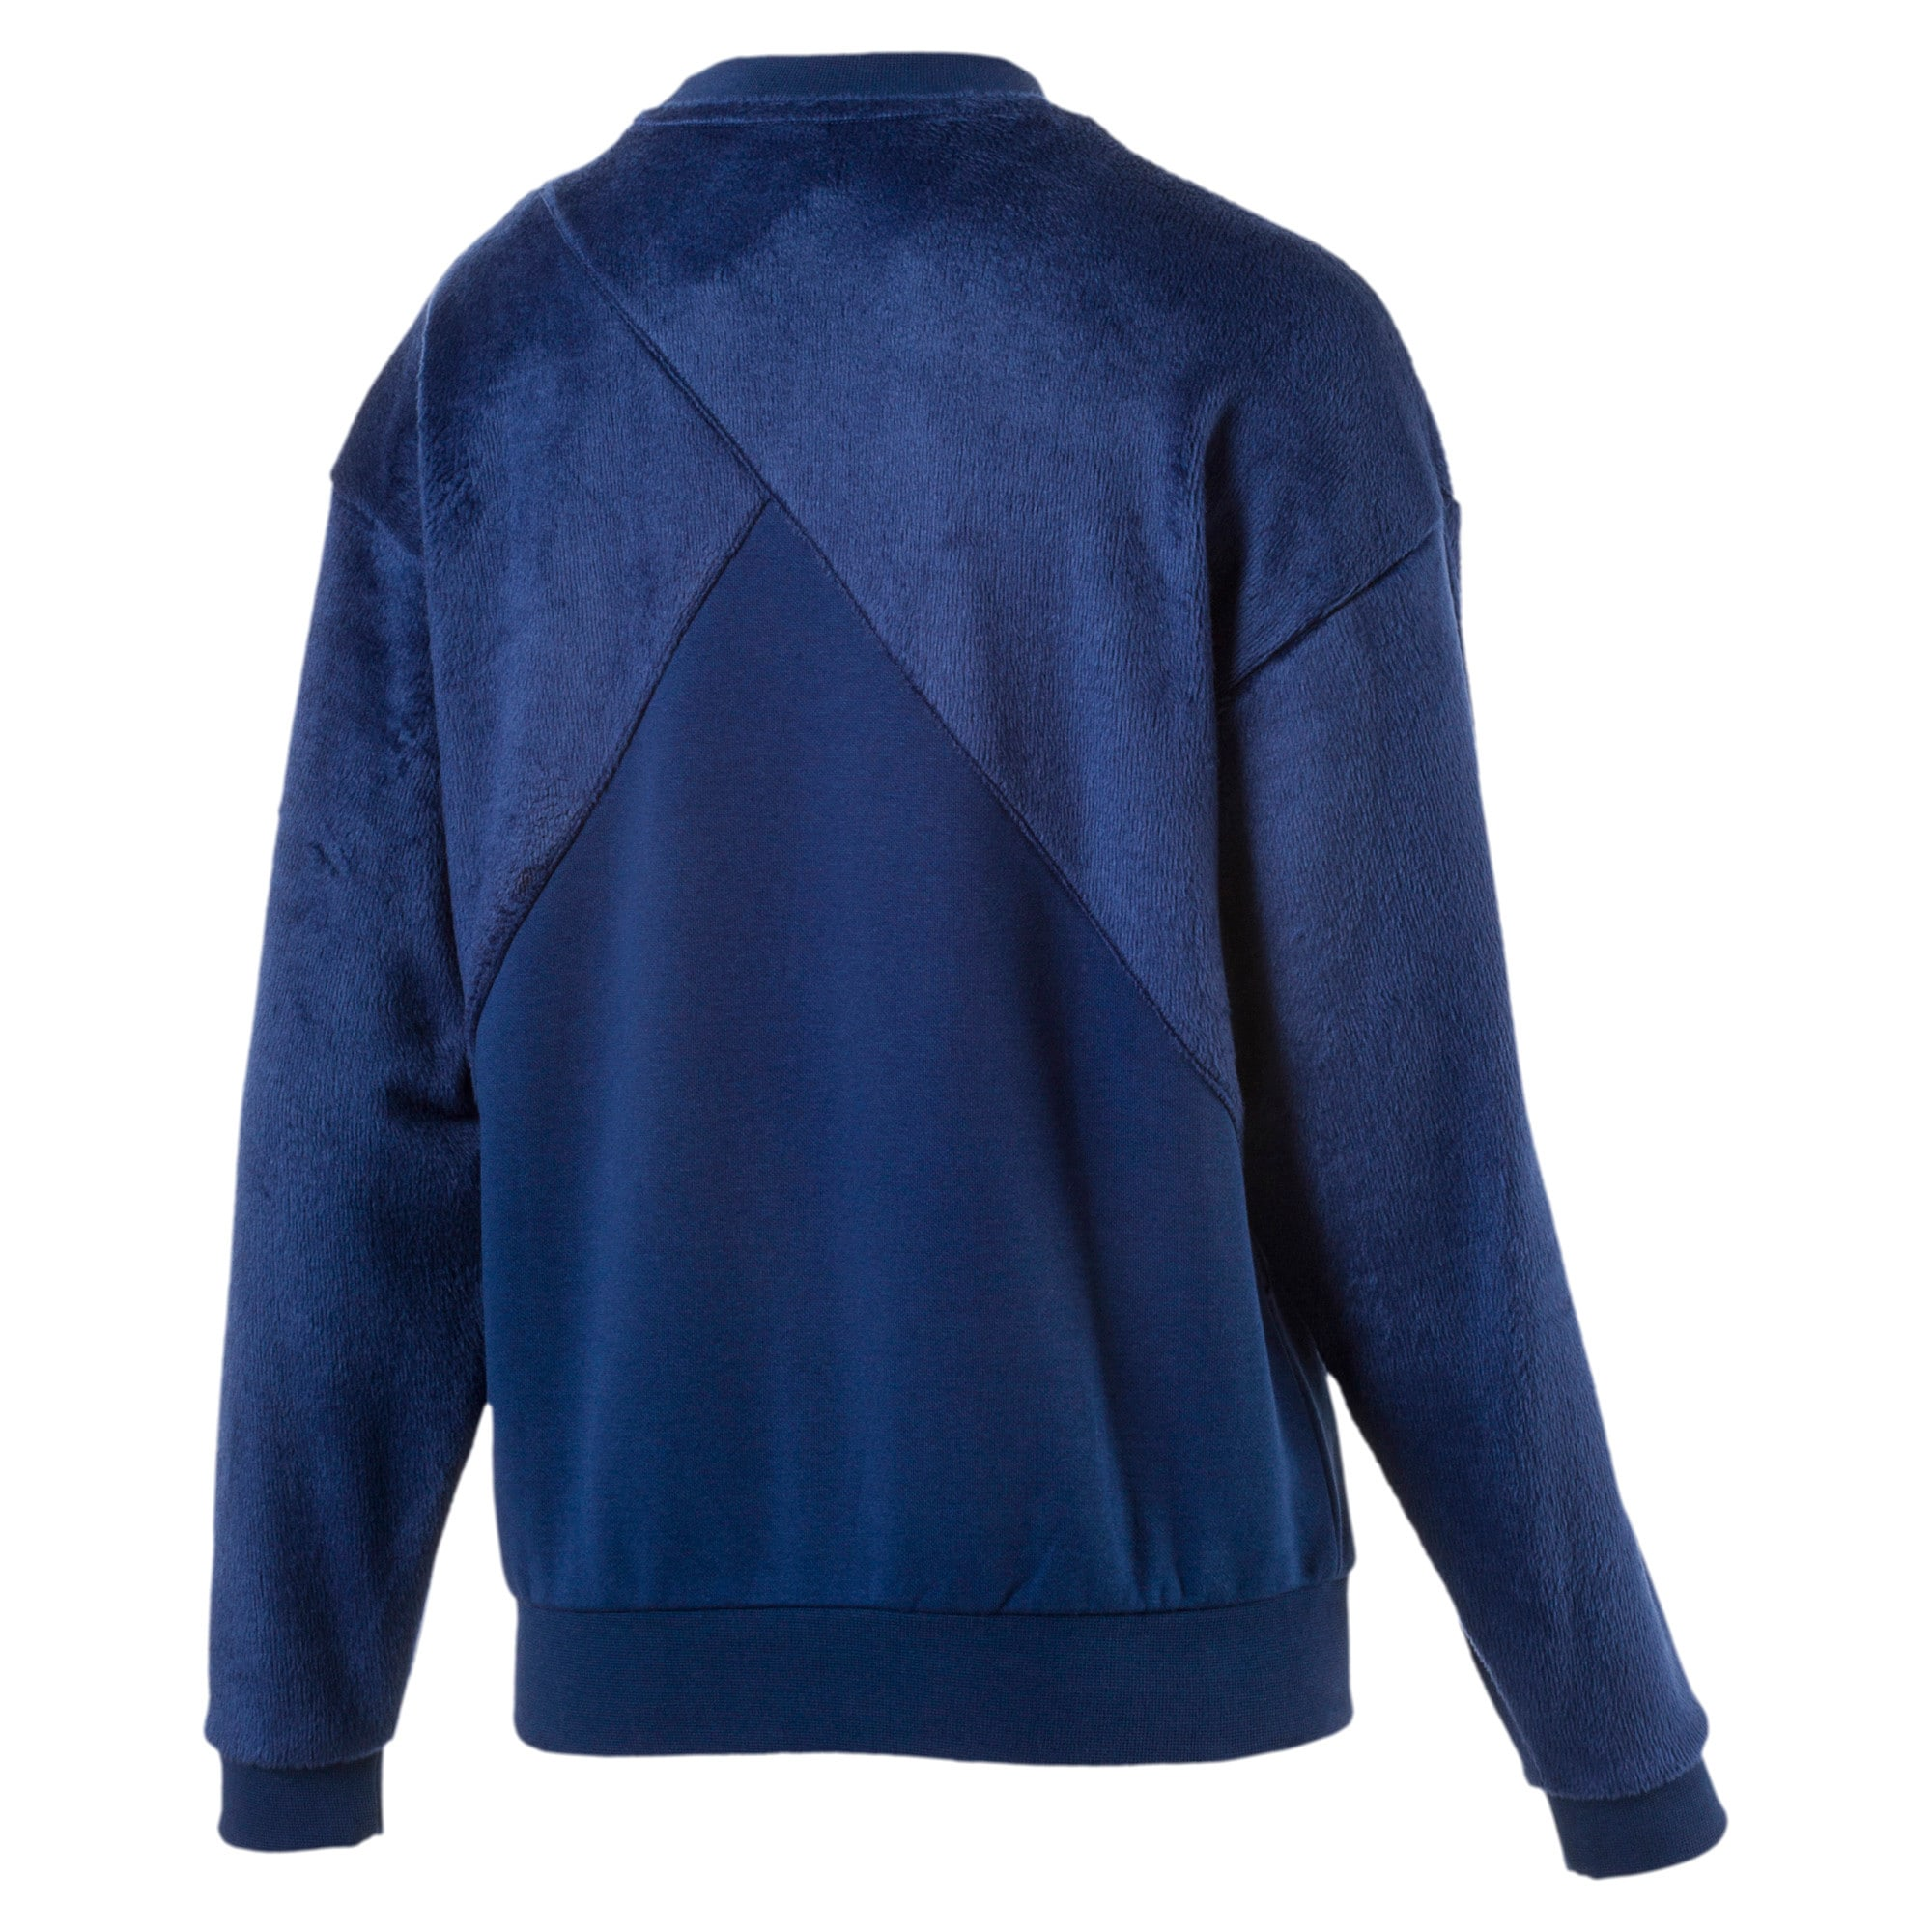 Thumbnail 1 of Archive Women's Fabric Block Sweater, Blue Depths, medium-IND